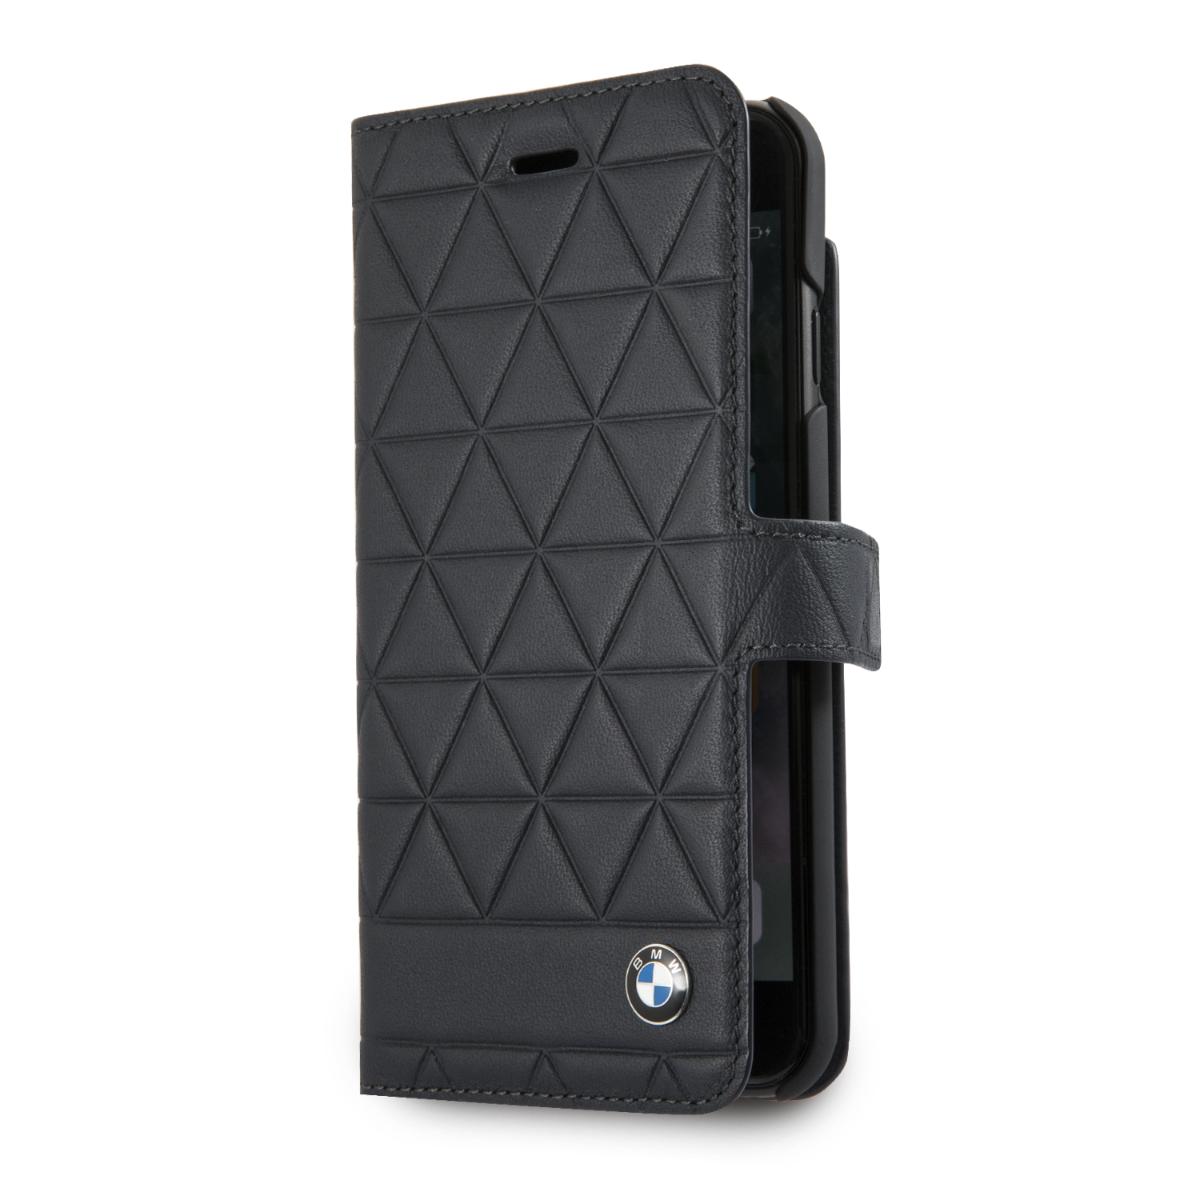 Pouzdro / kryt pro iPhone 7 / 8 - BMW, Hexagon Book Black